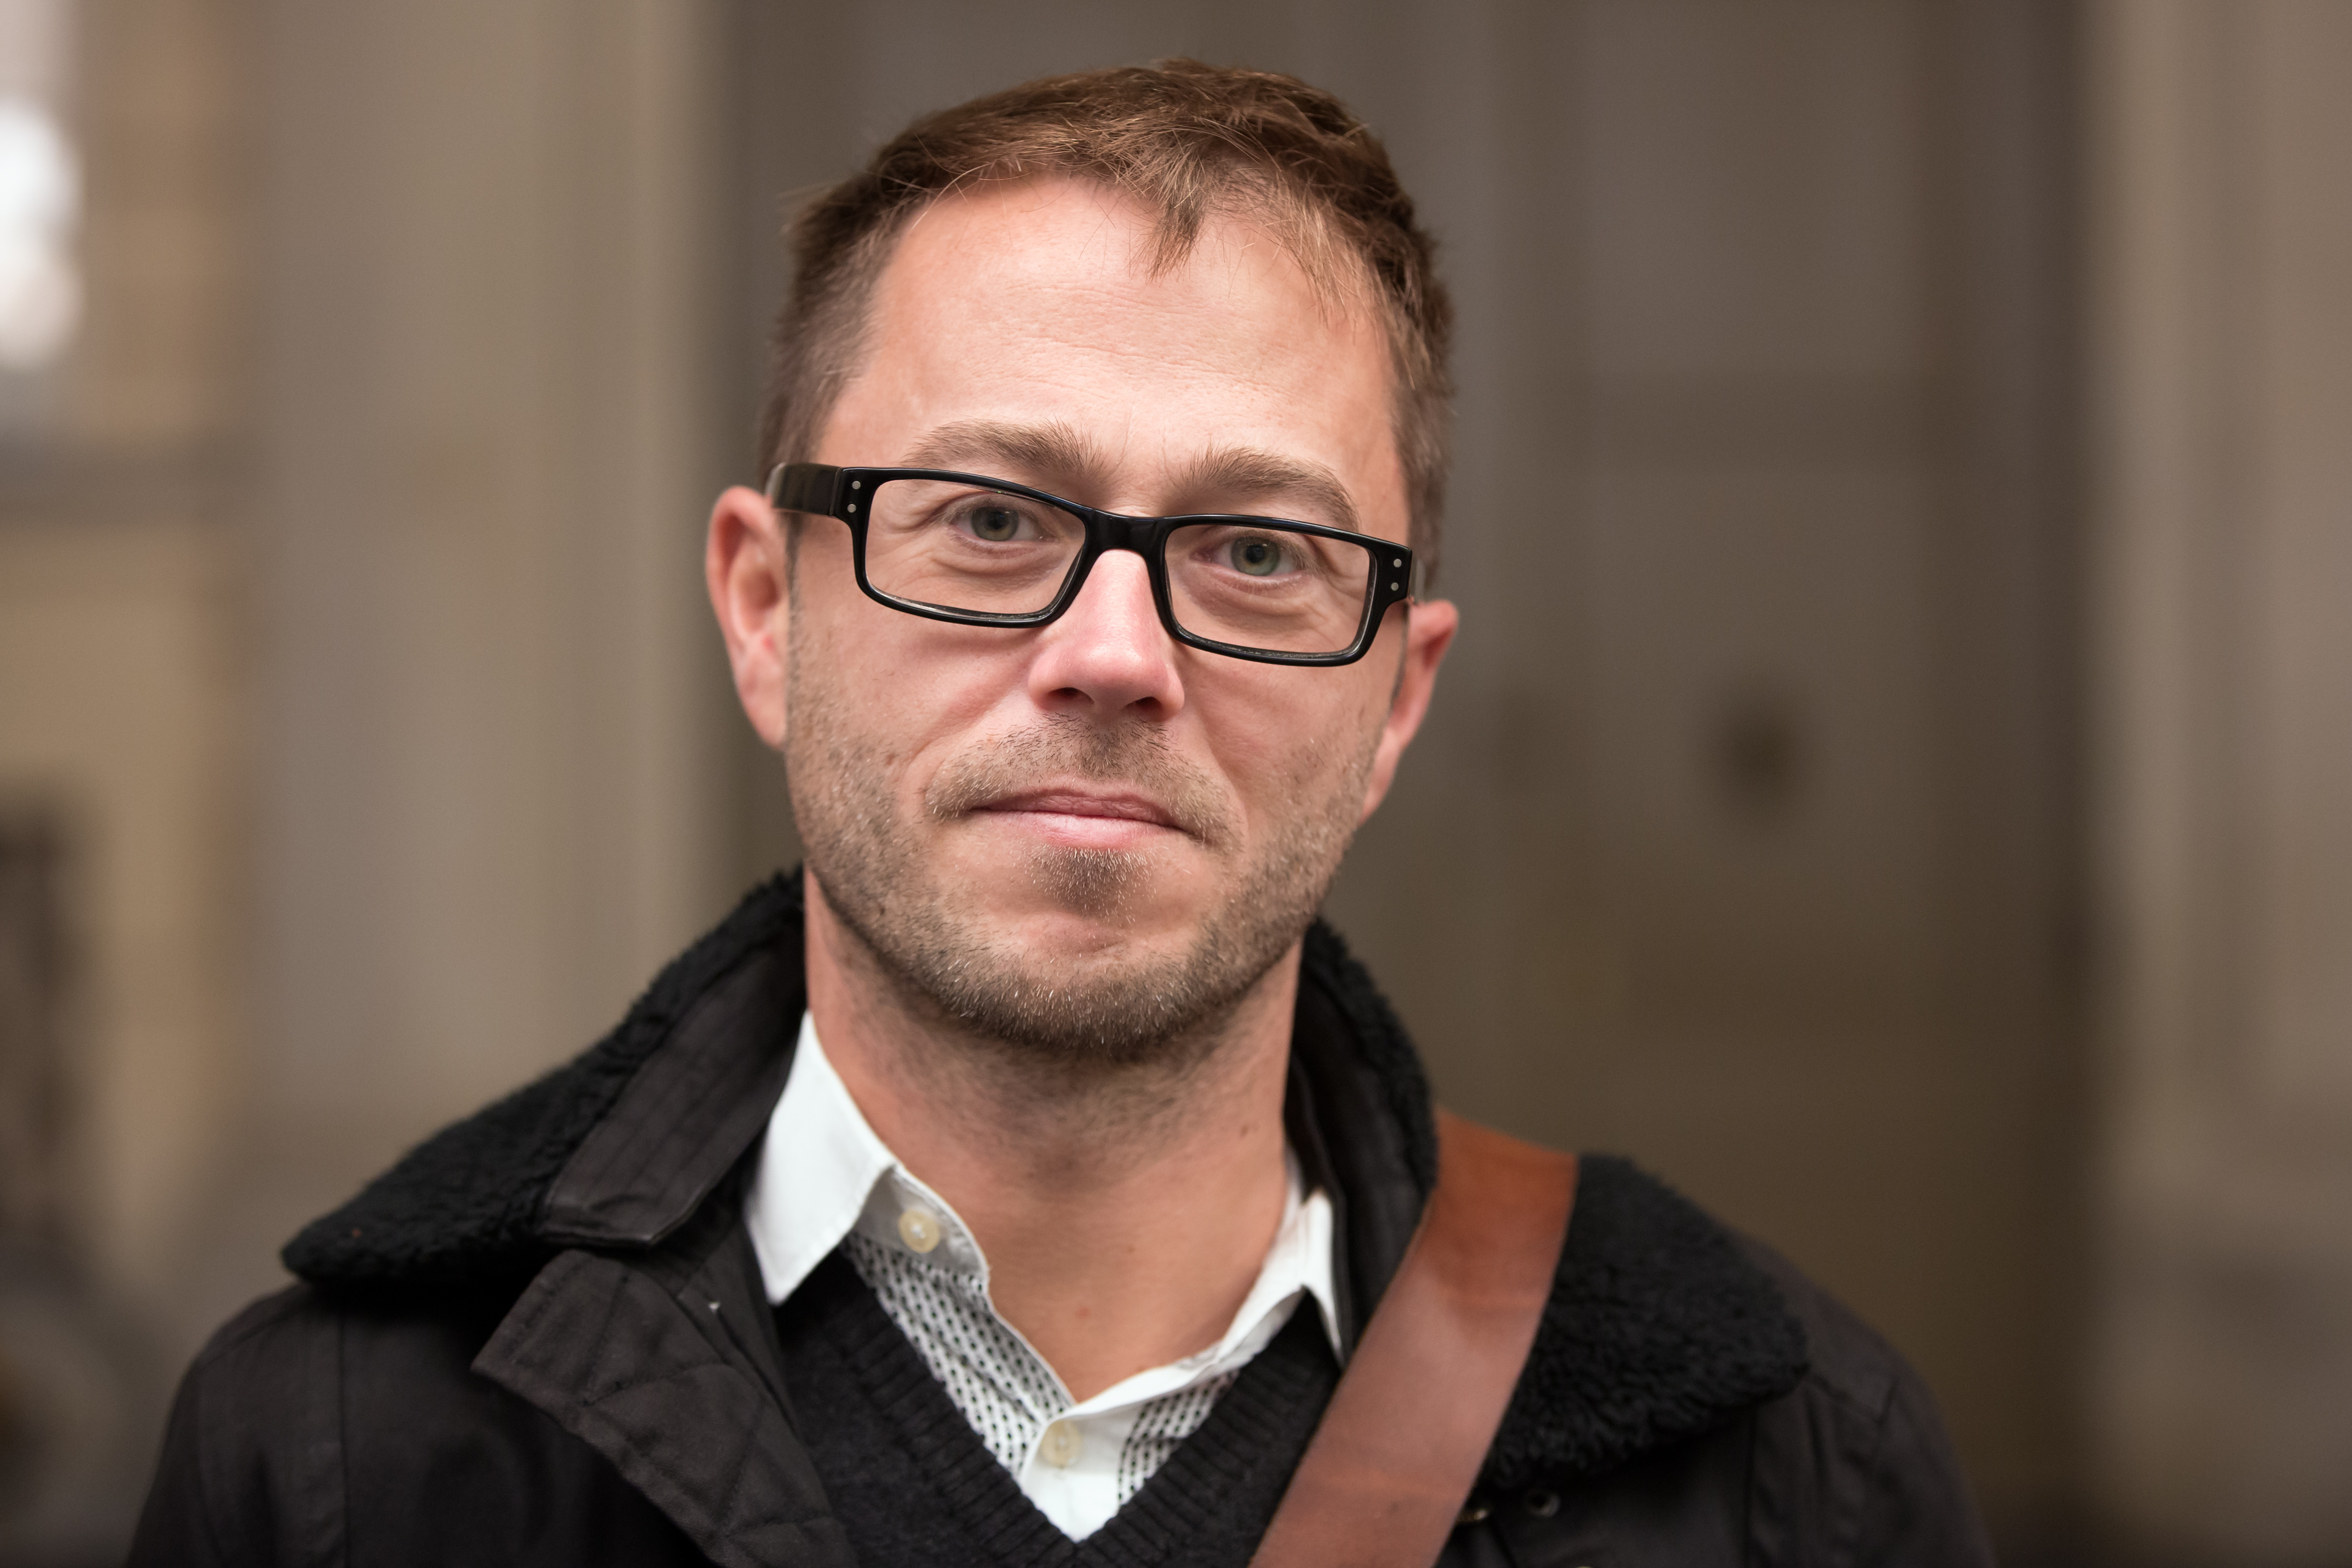 Jean-Gabriel Périot - Viennale 2015